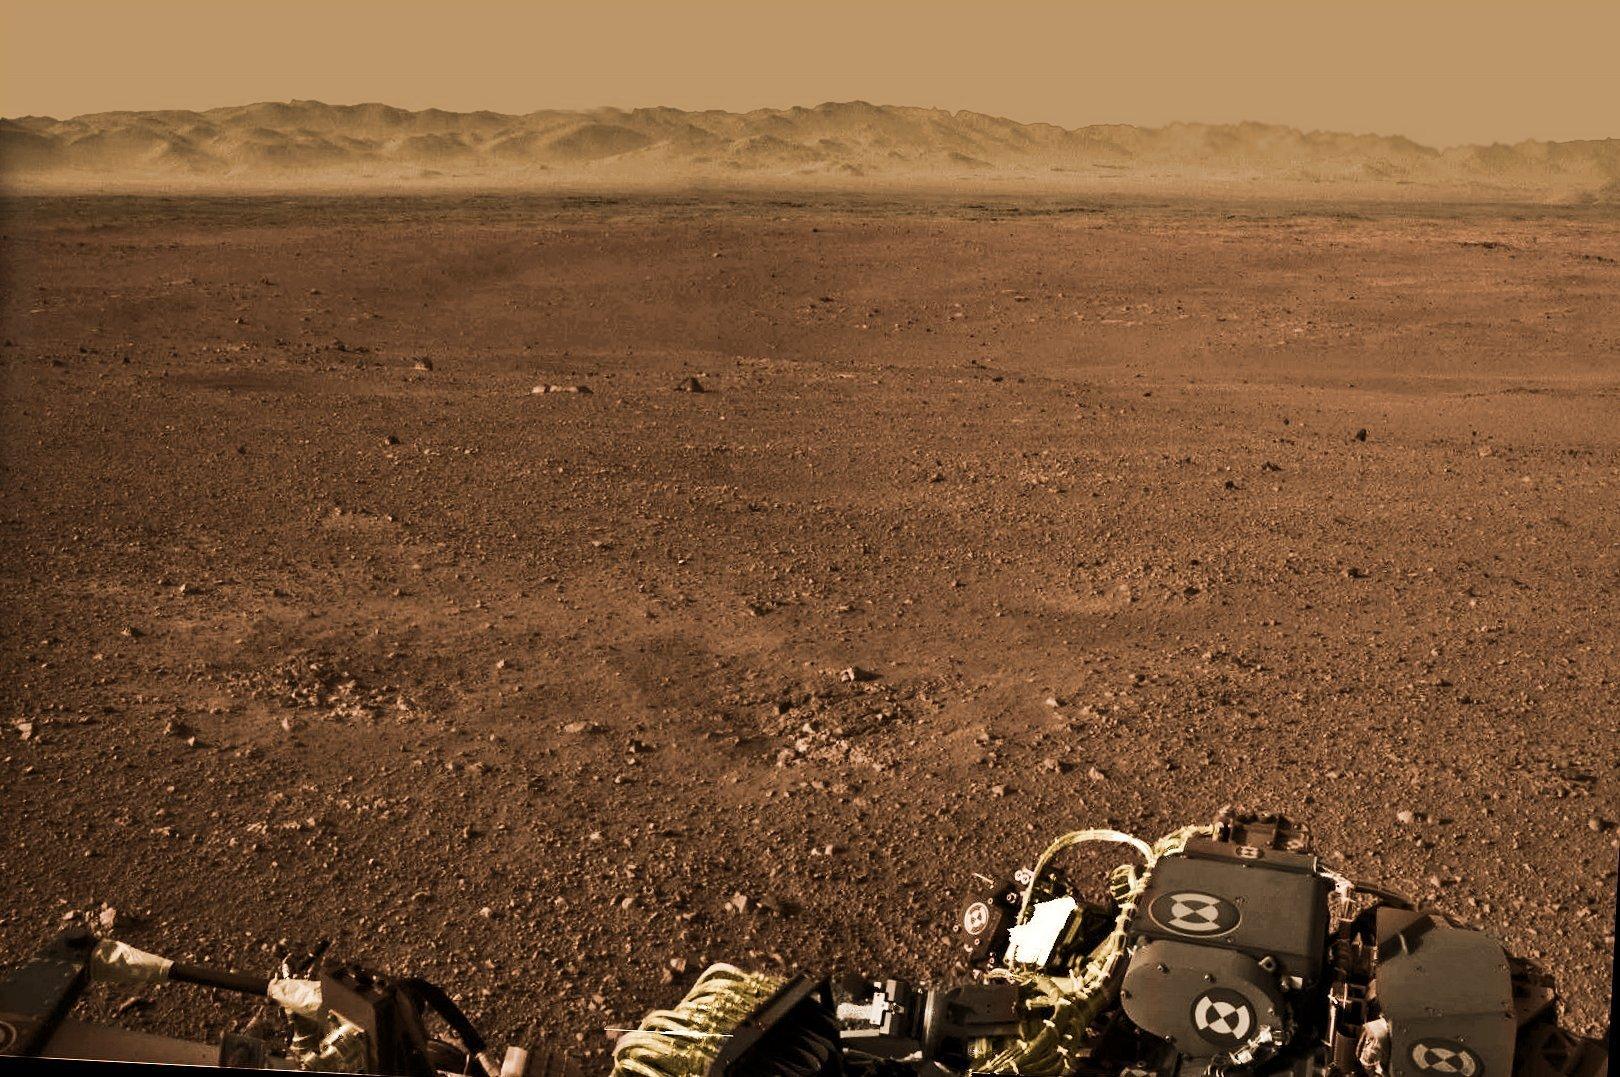 Marte en alta resoluciòn